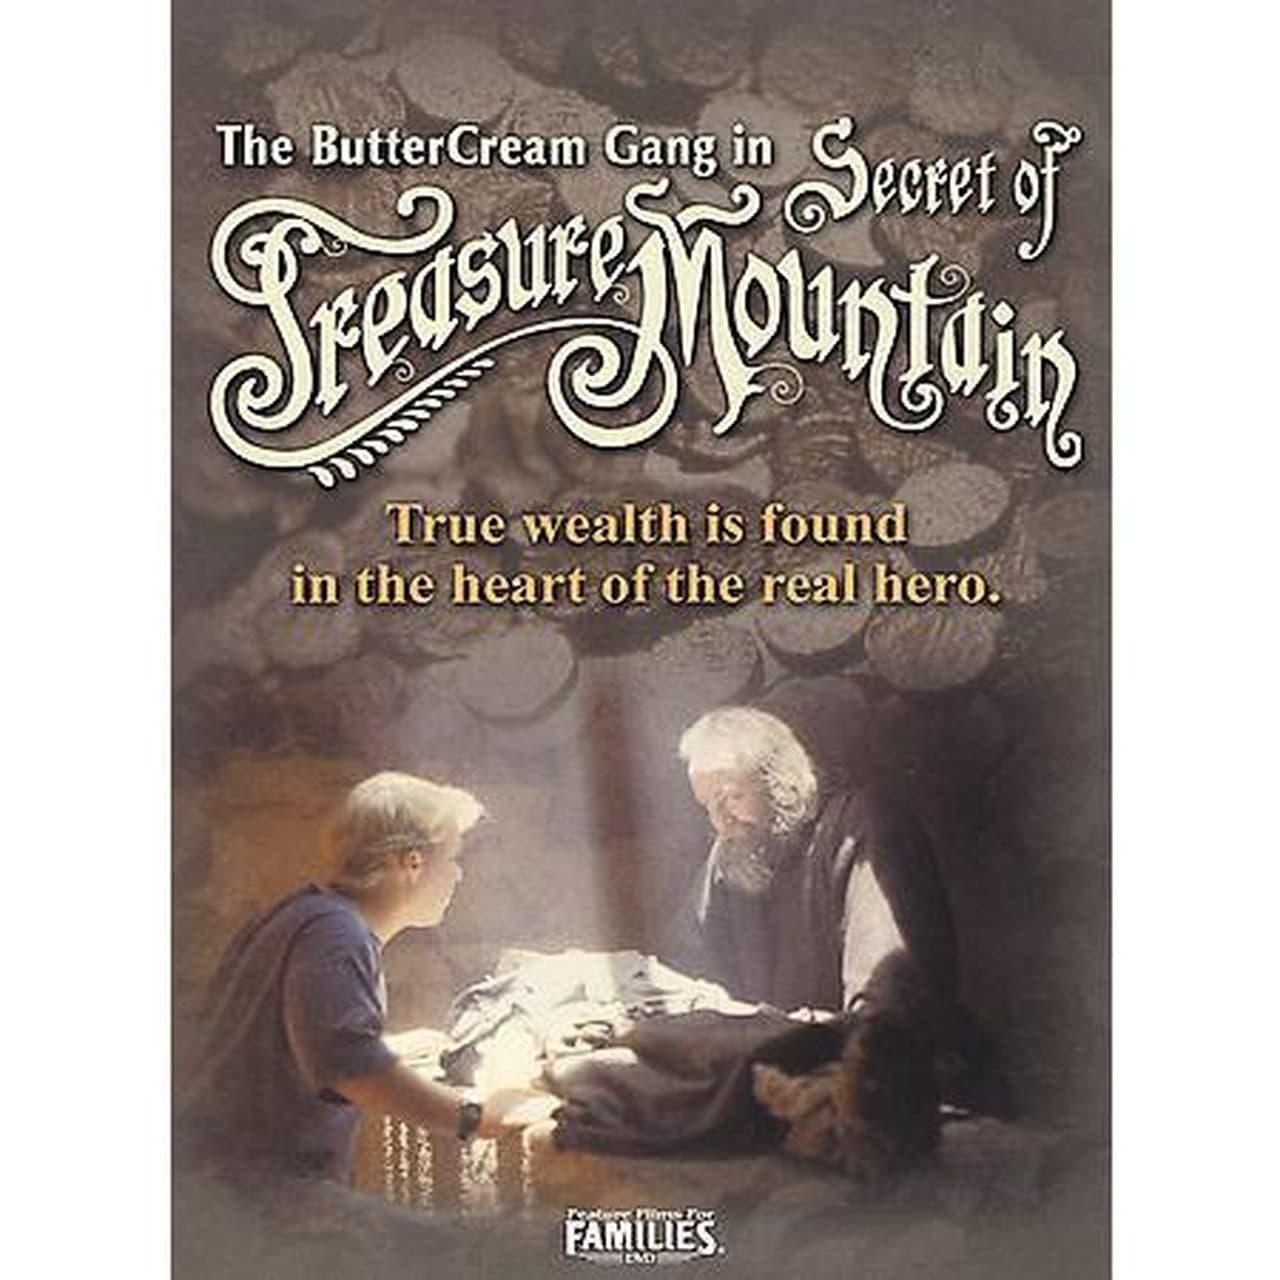 The Buttercream Gang in Secret Of Treasure Mountain